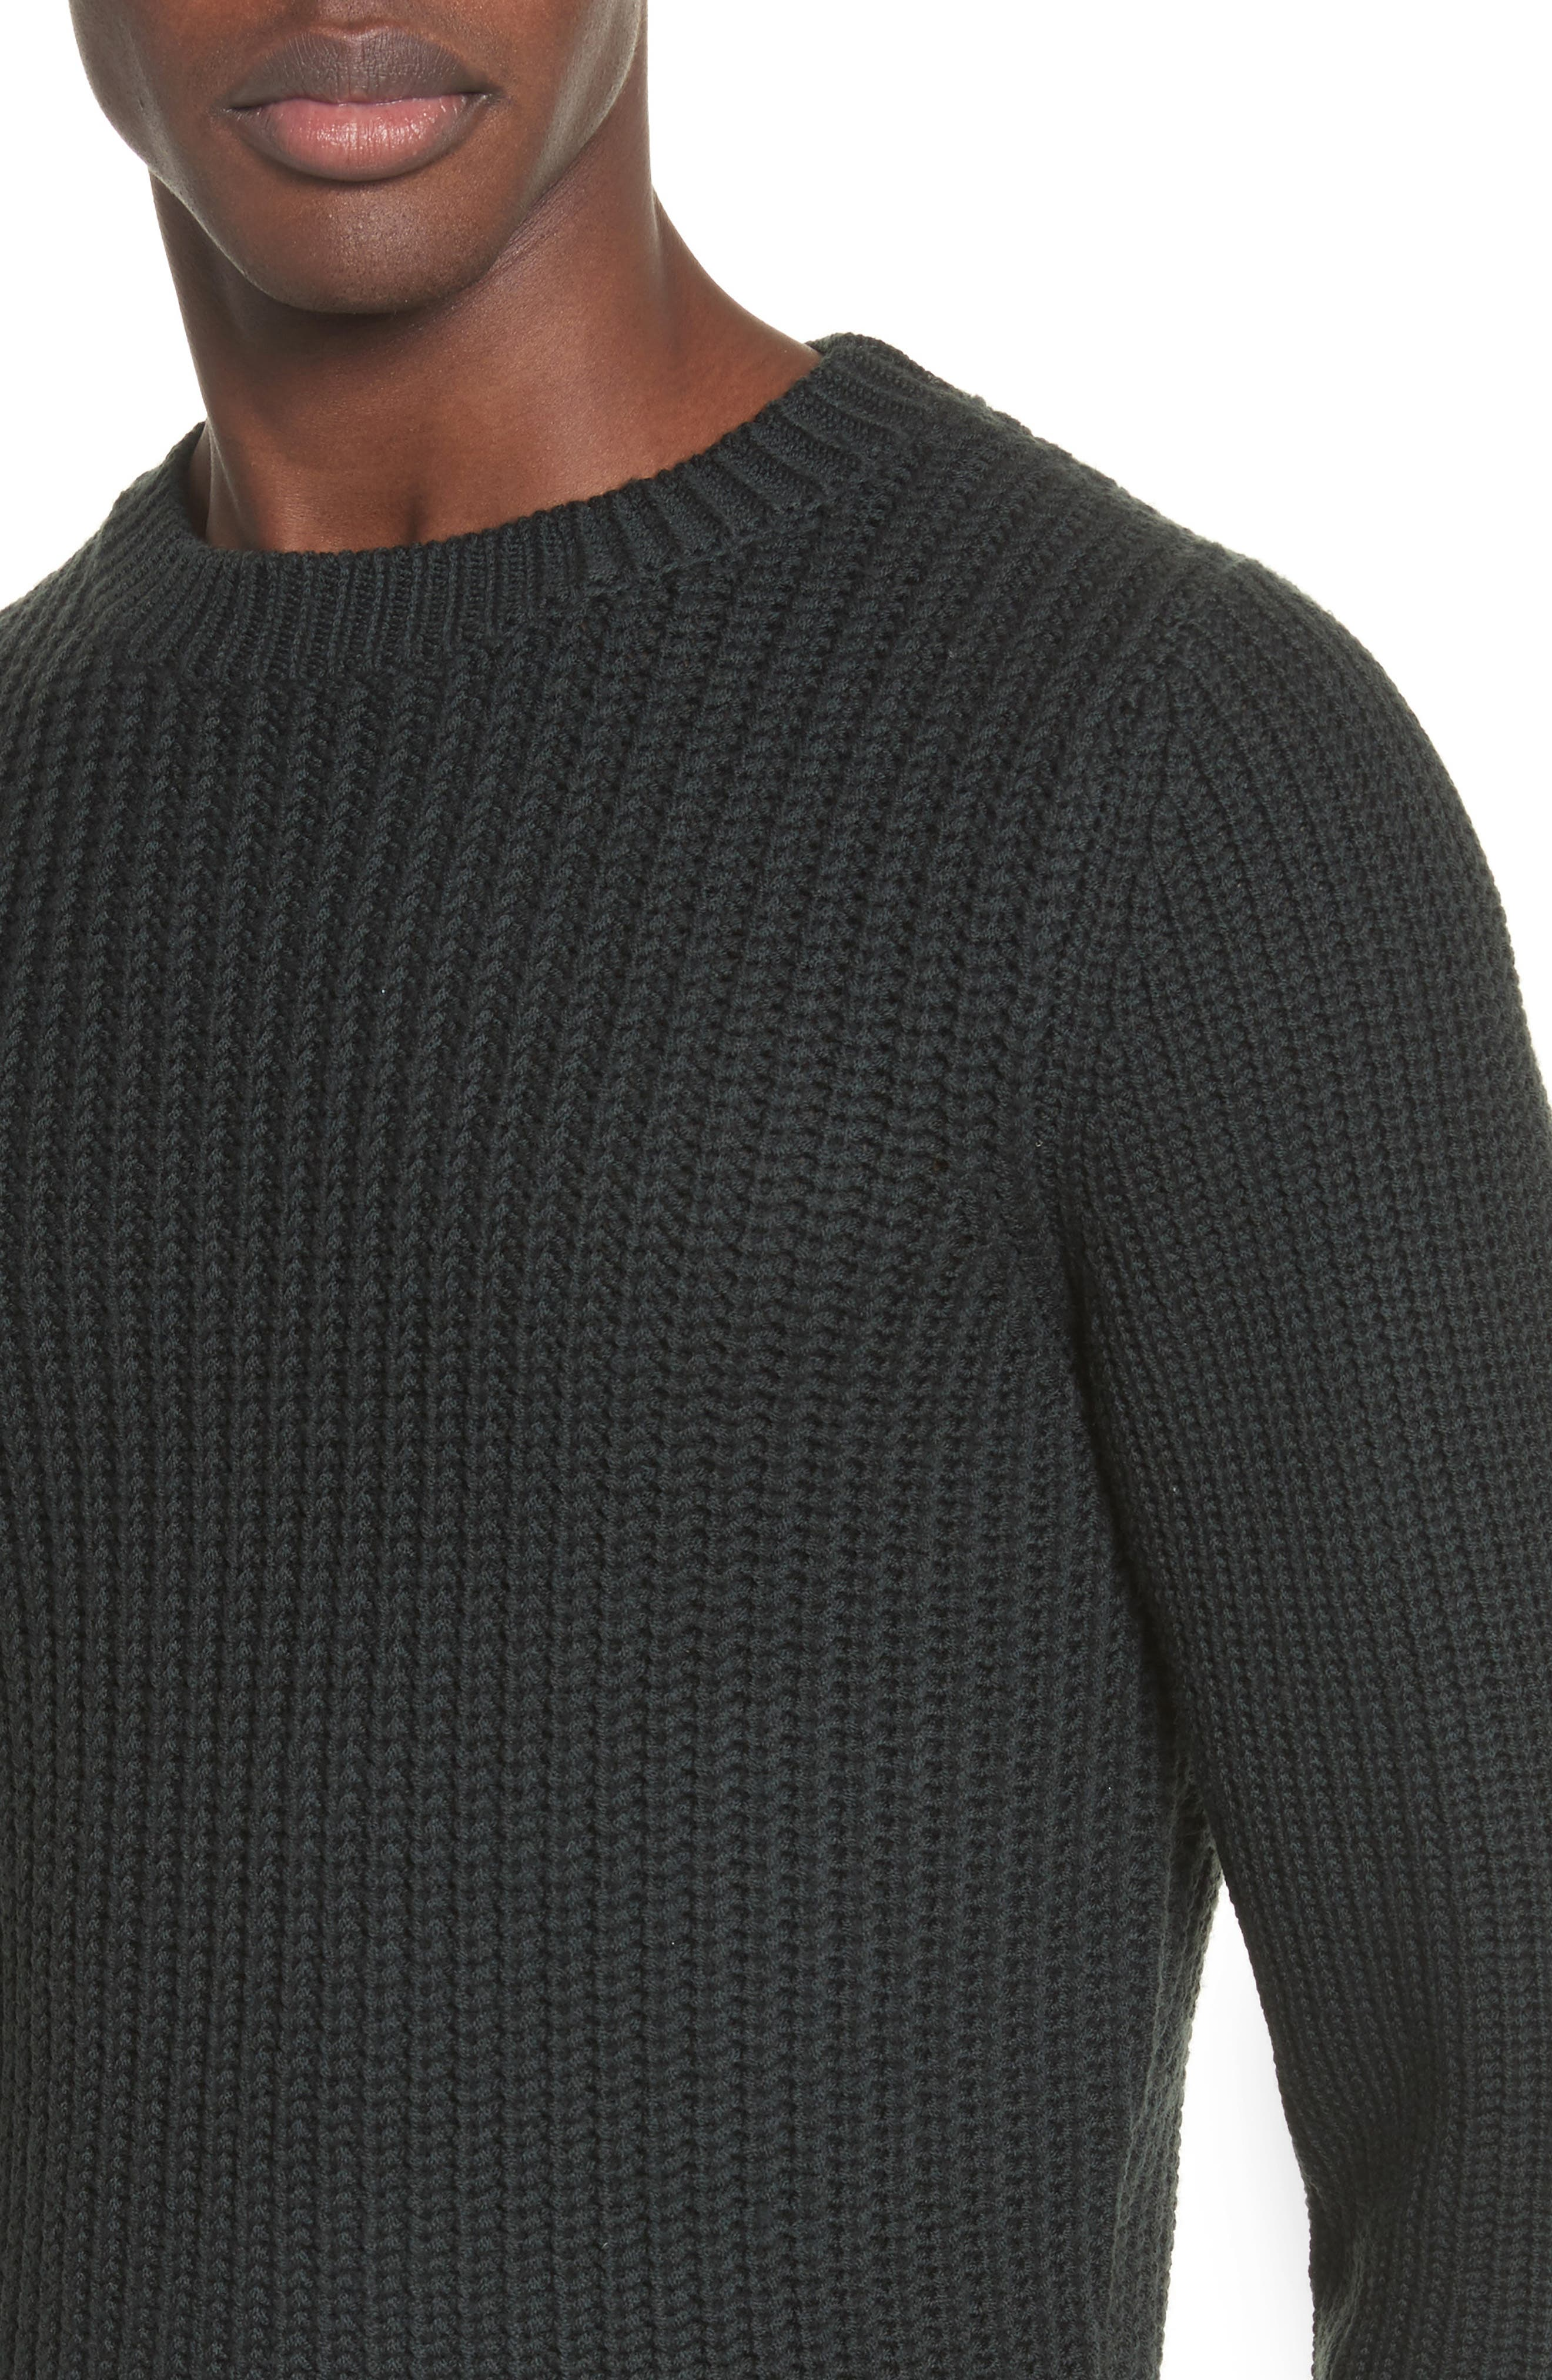 Pull Berger Merino Wool Sweater,                             Alternate thumbnail 4, color,                             300